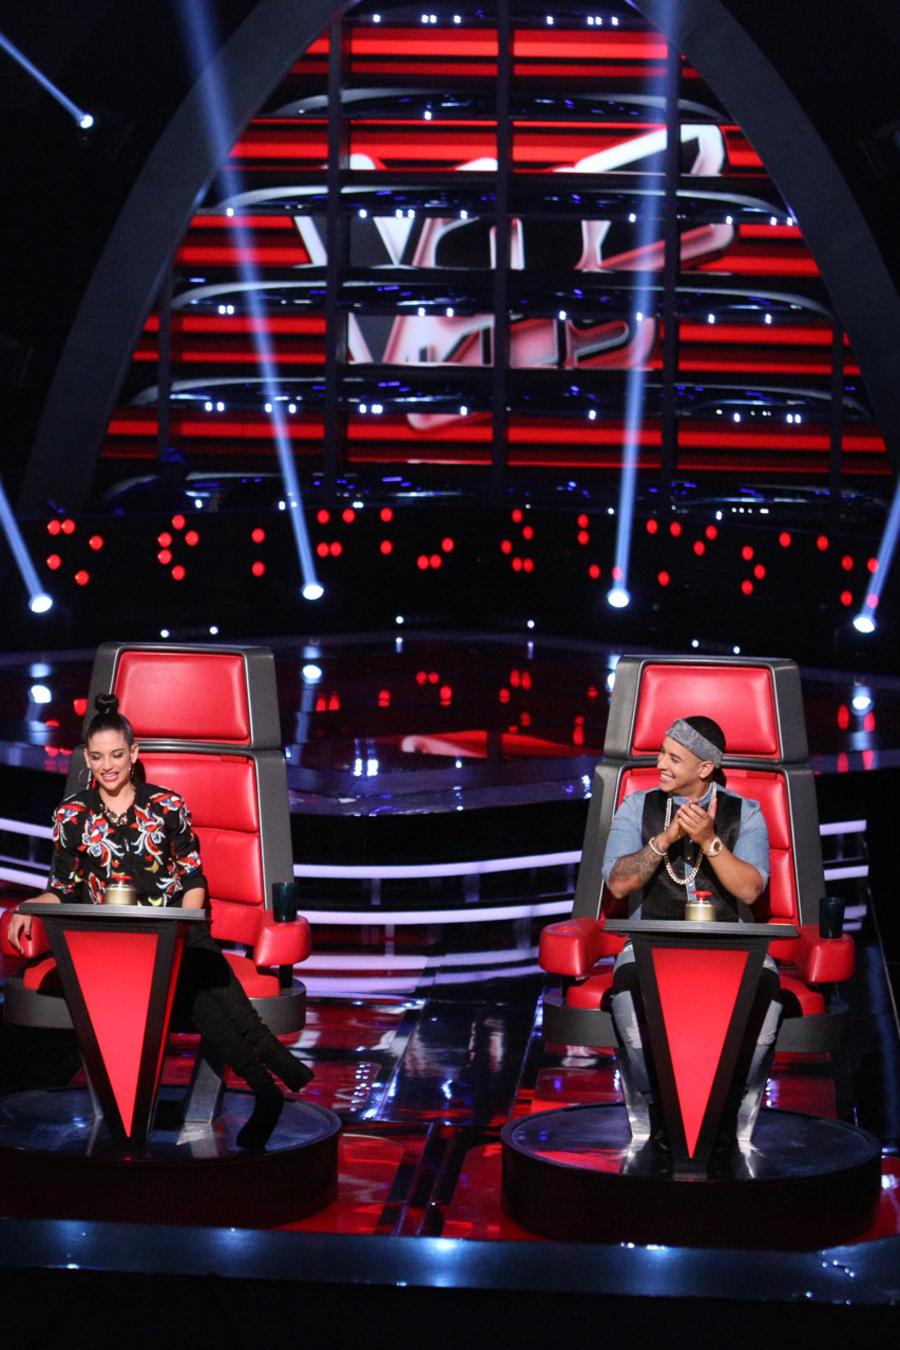 Pedro Fernández Daddy Yankee Natalia Jiménez audiciones a ciegas La Voz Kids 2016